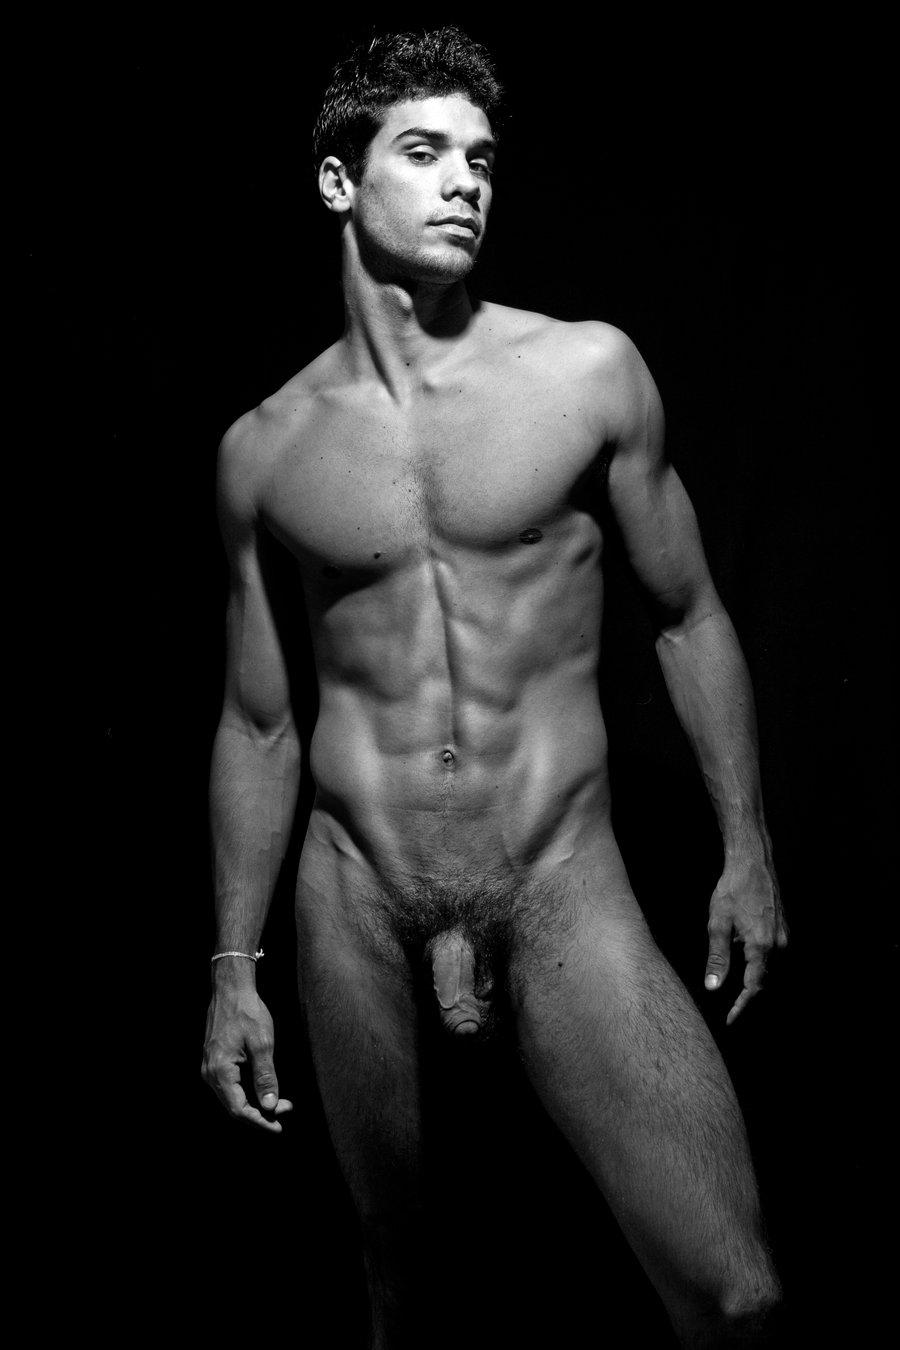 Naked photos young boy nudists